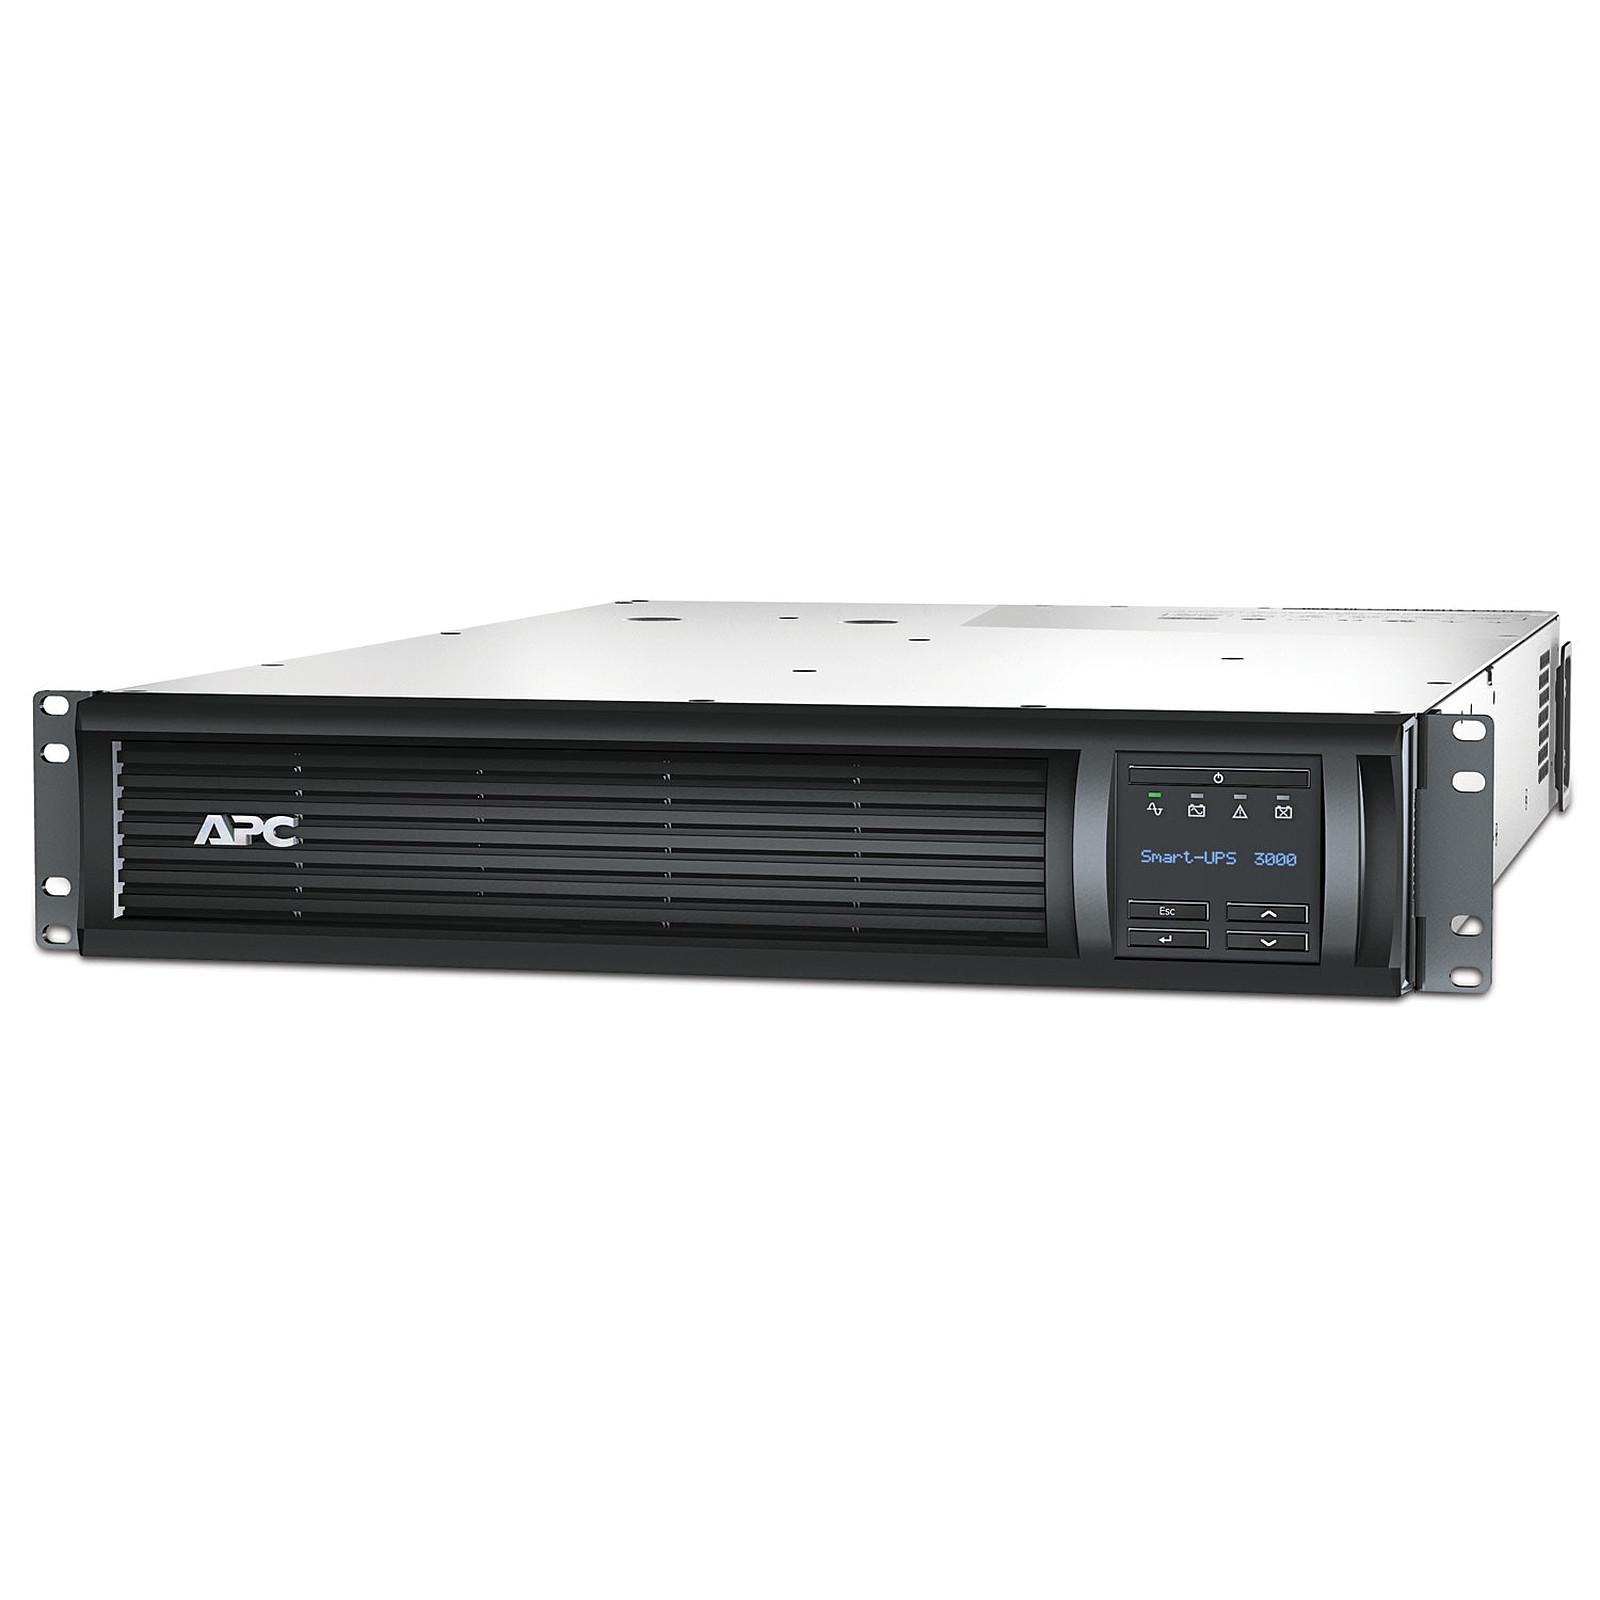 APC Smart-UPS Rack-Mount 3000VA LCD 230V